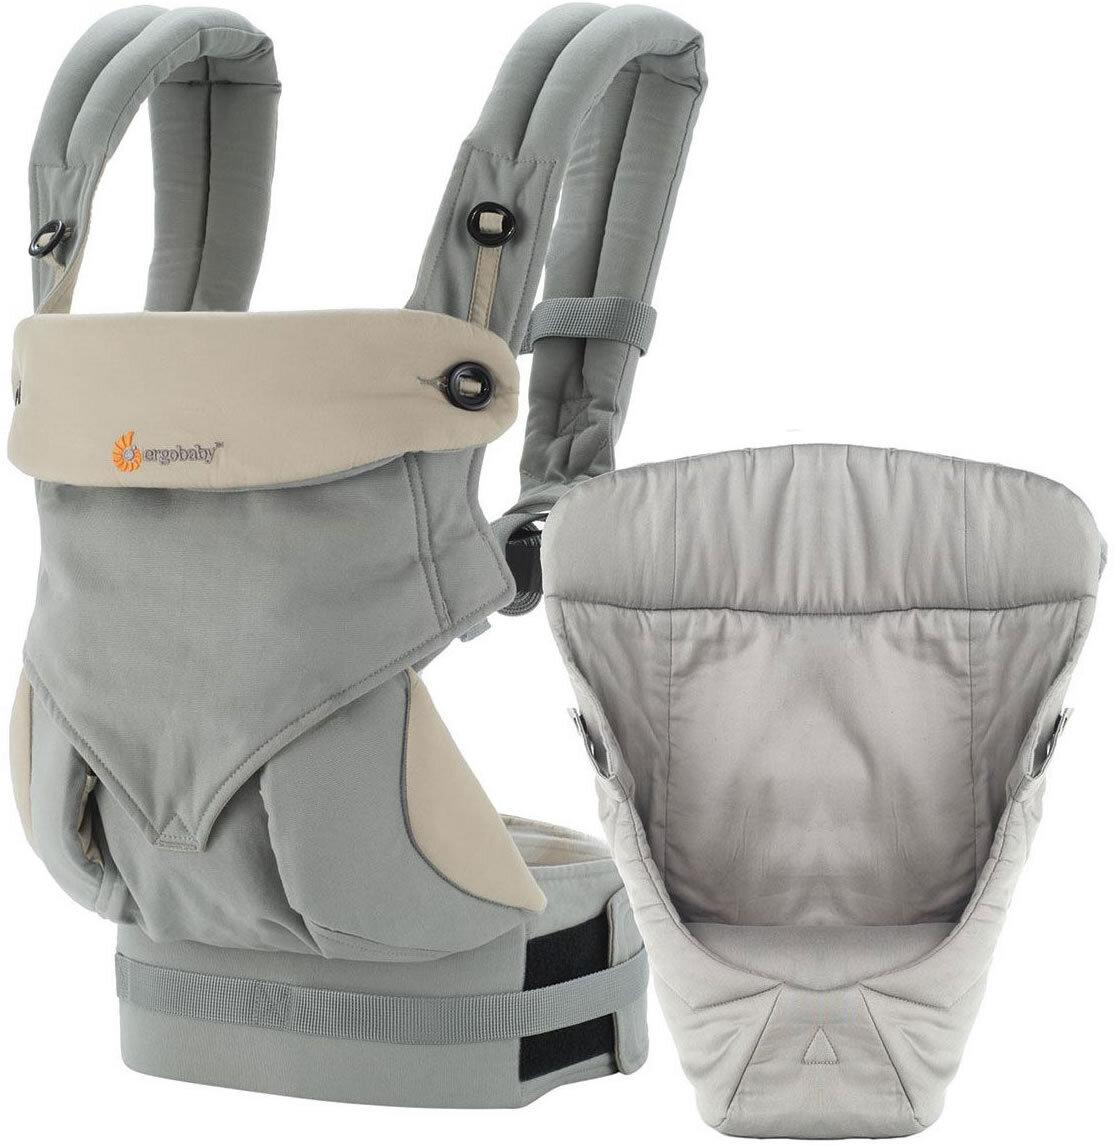 ergobaby-360-bundle-of-joy-infant-carrier-with-easy-snug-insert-grey-36.jpg